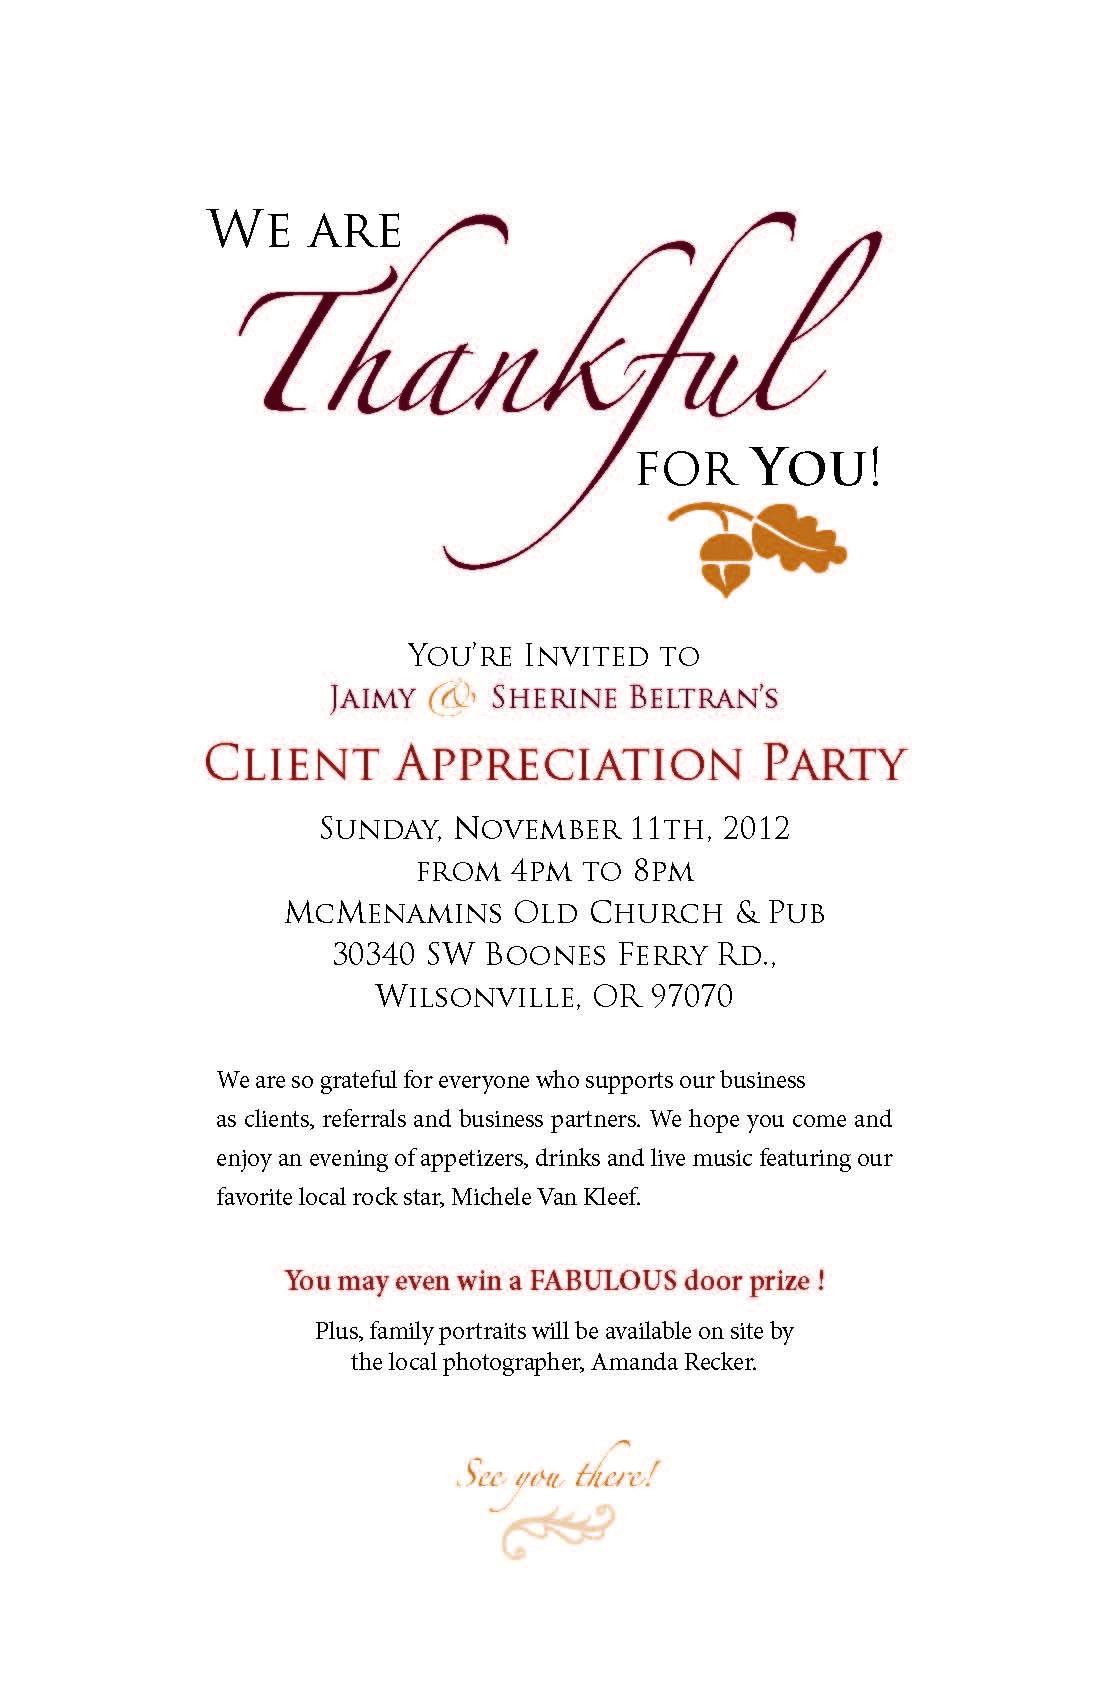 Client Appreciation Party Invitation Wording Inviviewco